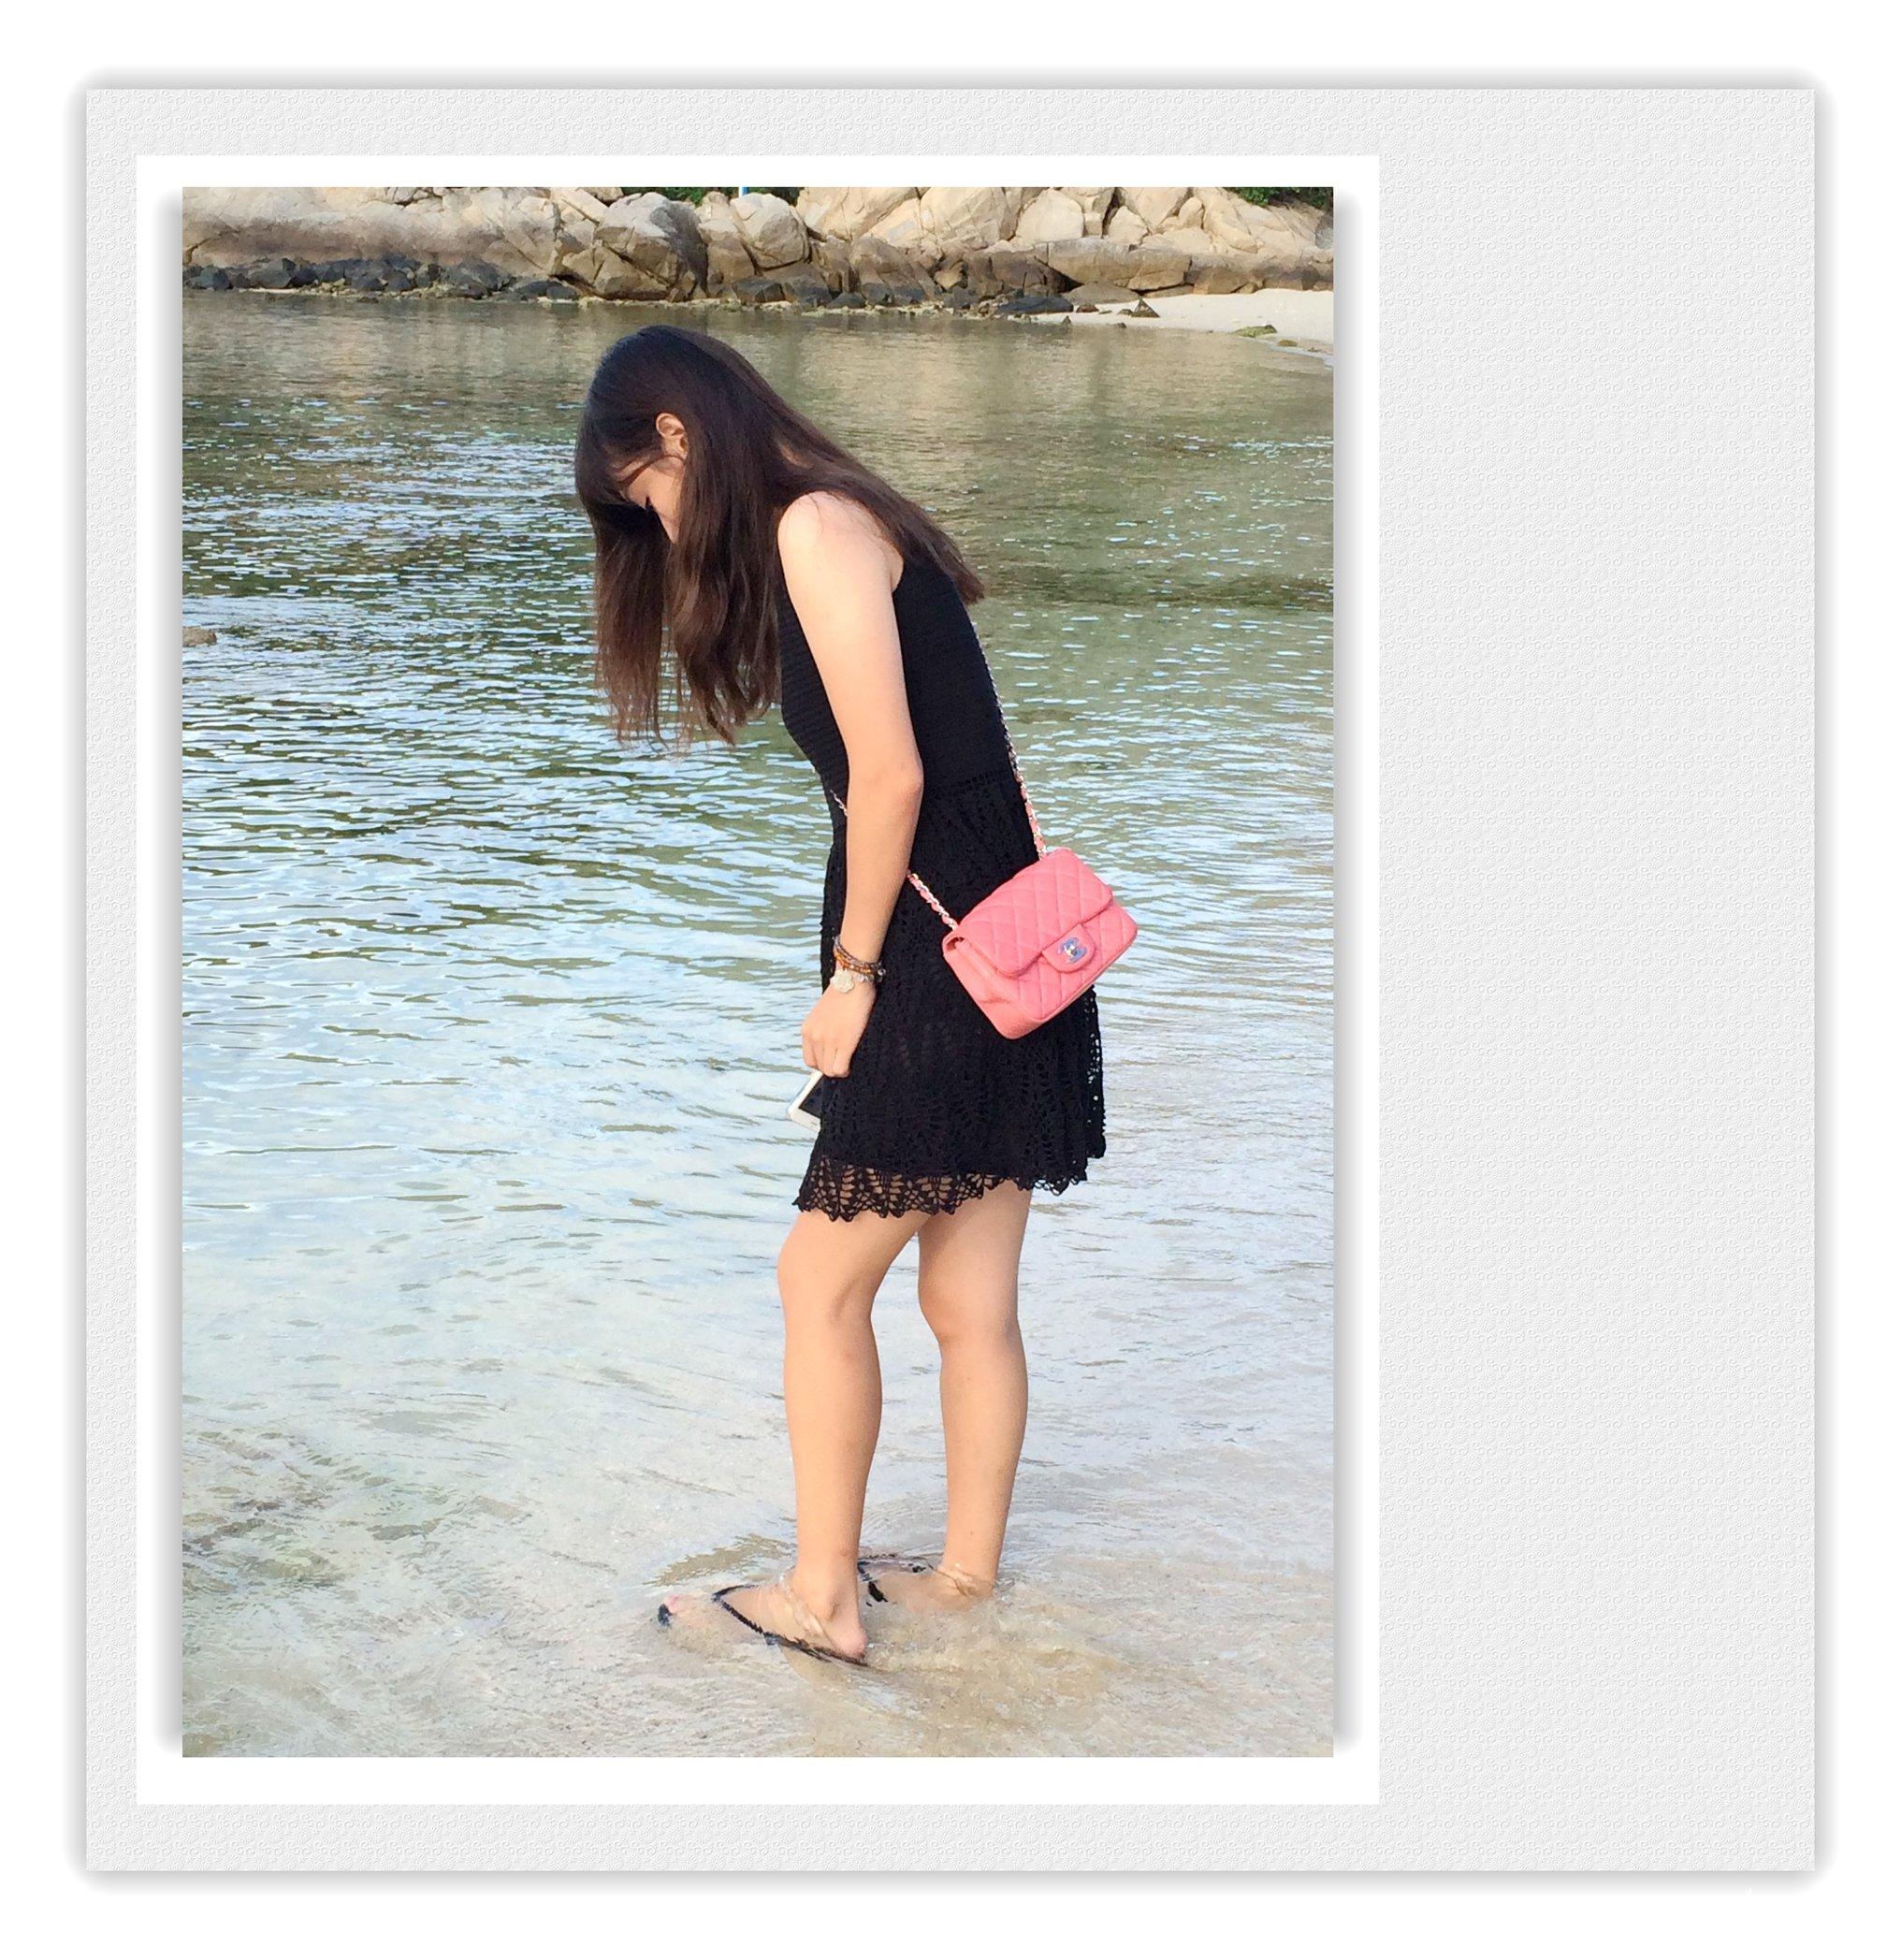 PIC_20150803_175950_C21.jpg